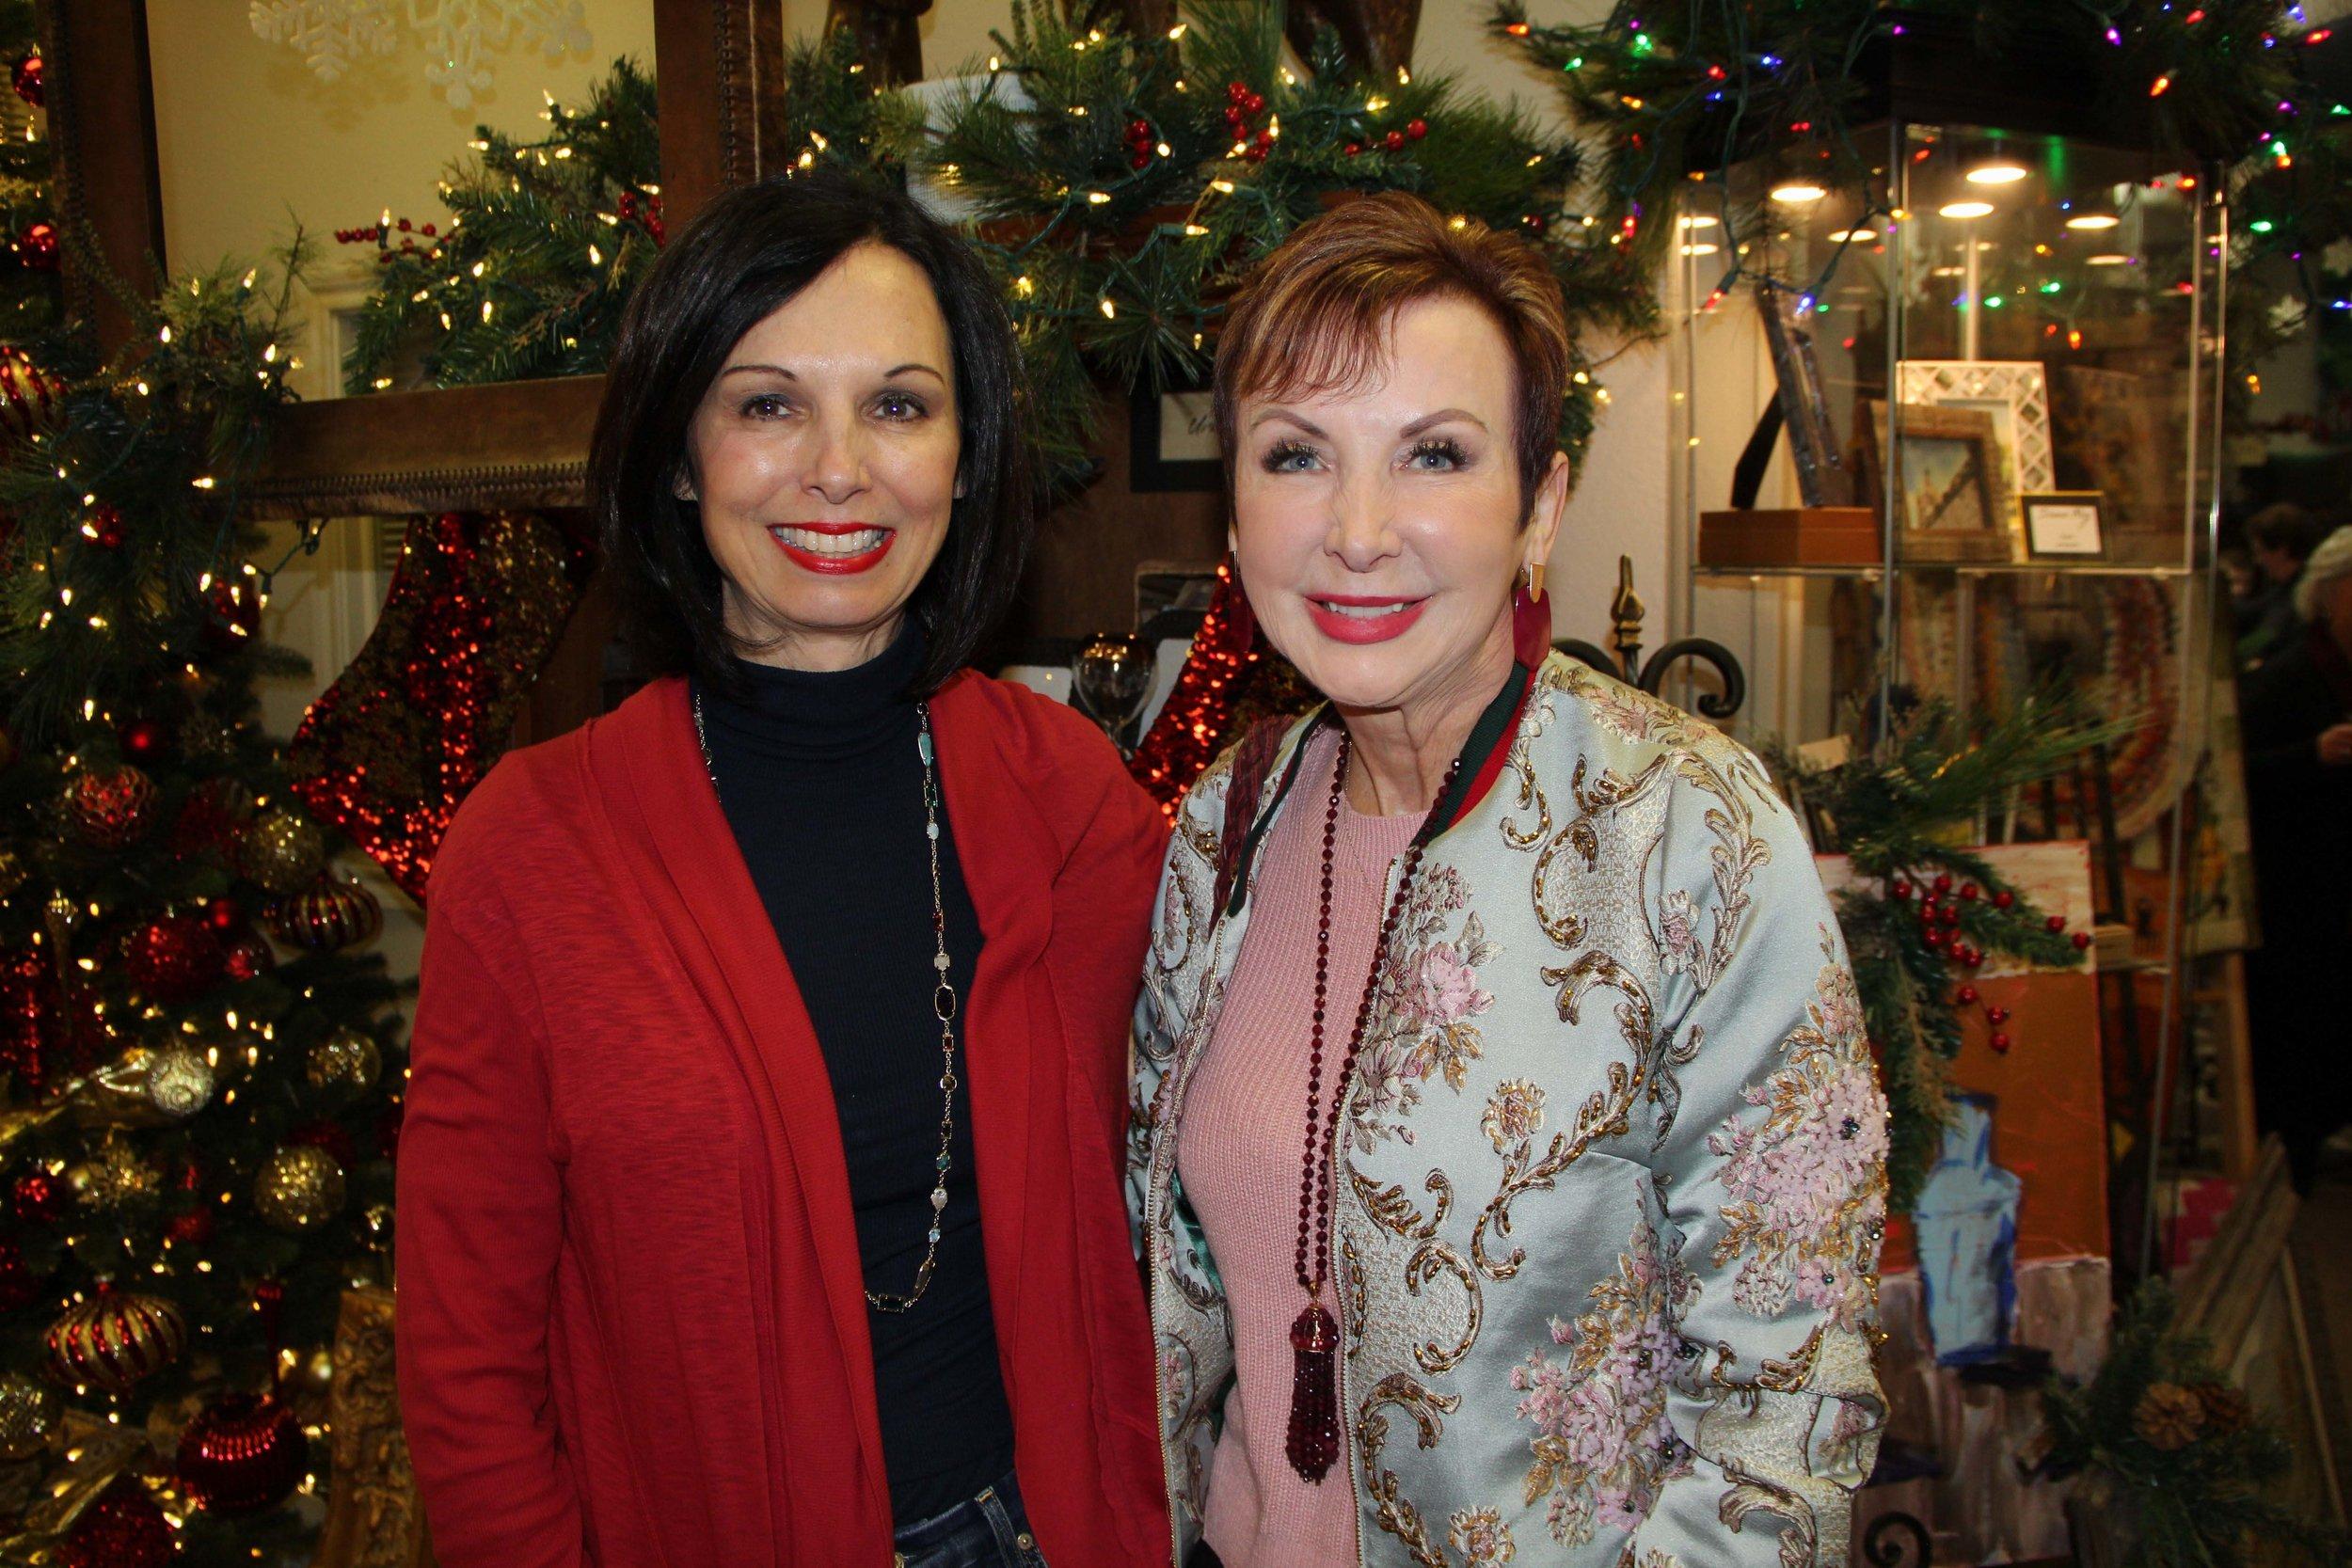 Melinda Vammen and Lena O'Dell